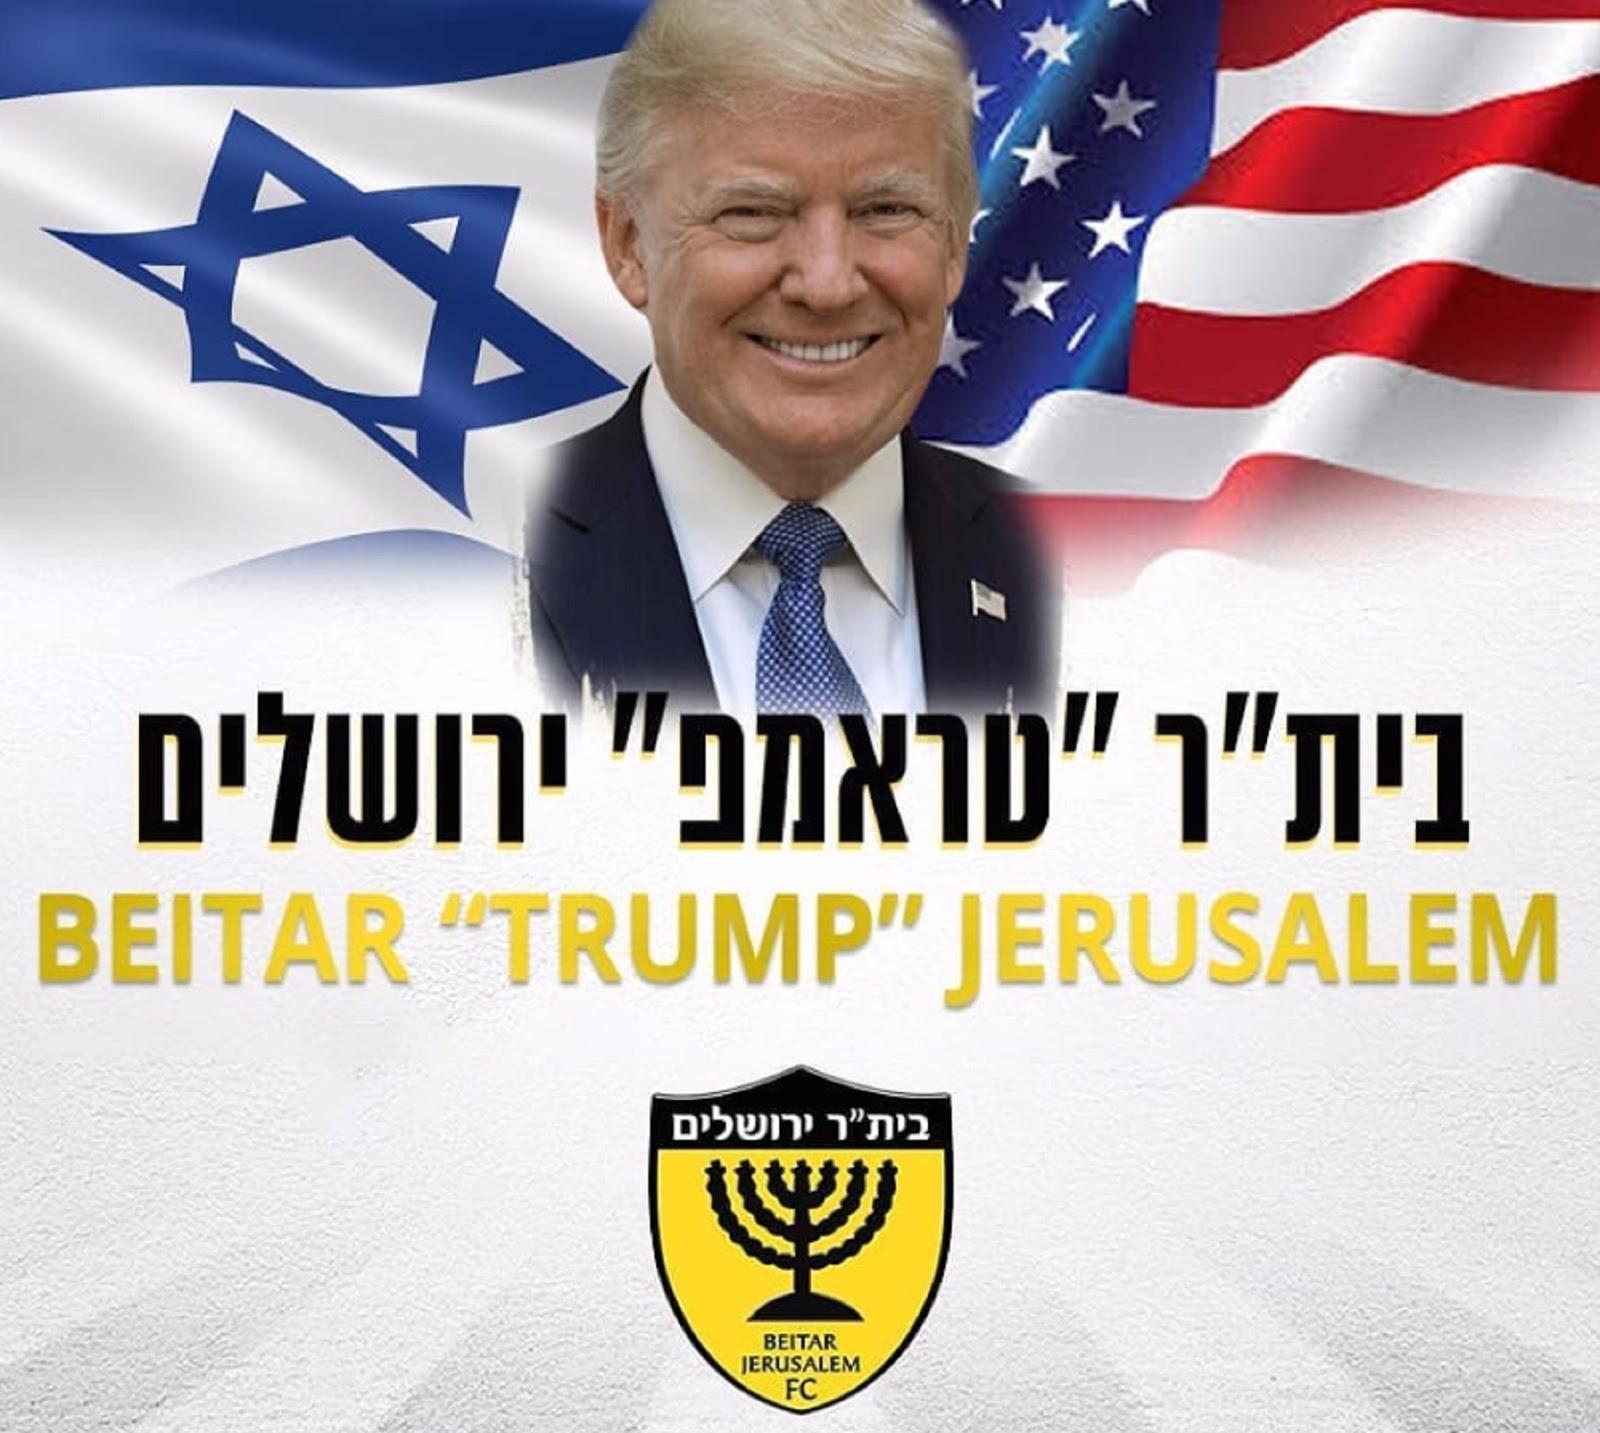 BEITAR TRUMP JERUSALEM